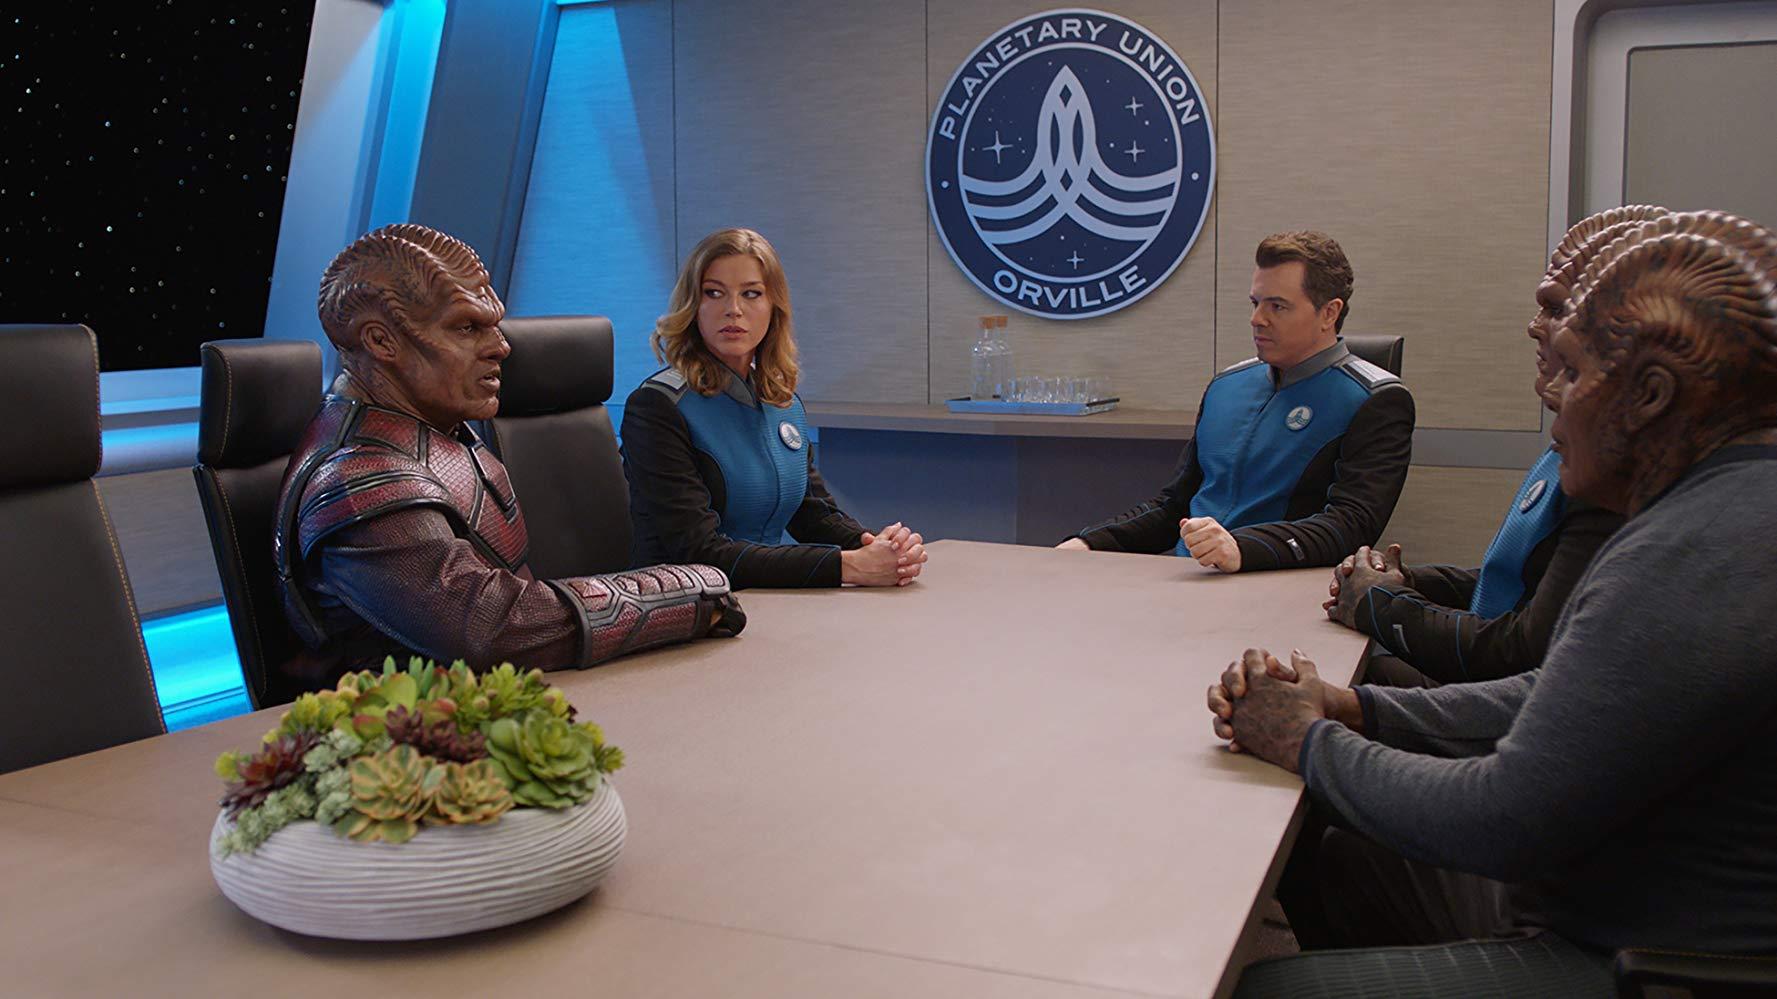 The Orville; Star Trek, sci-fi, critics, editorial